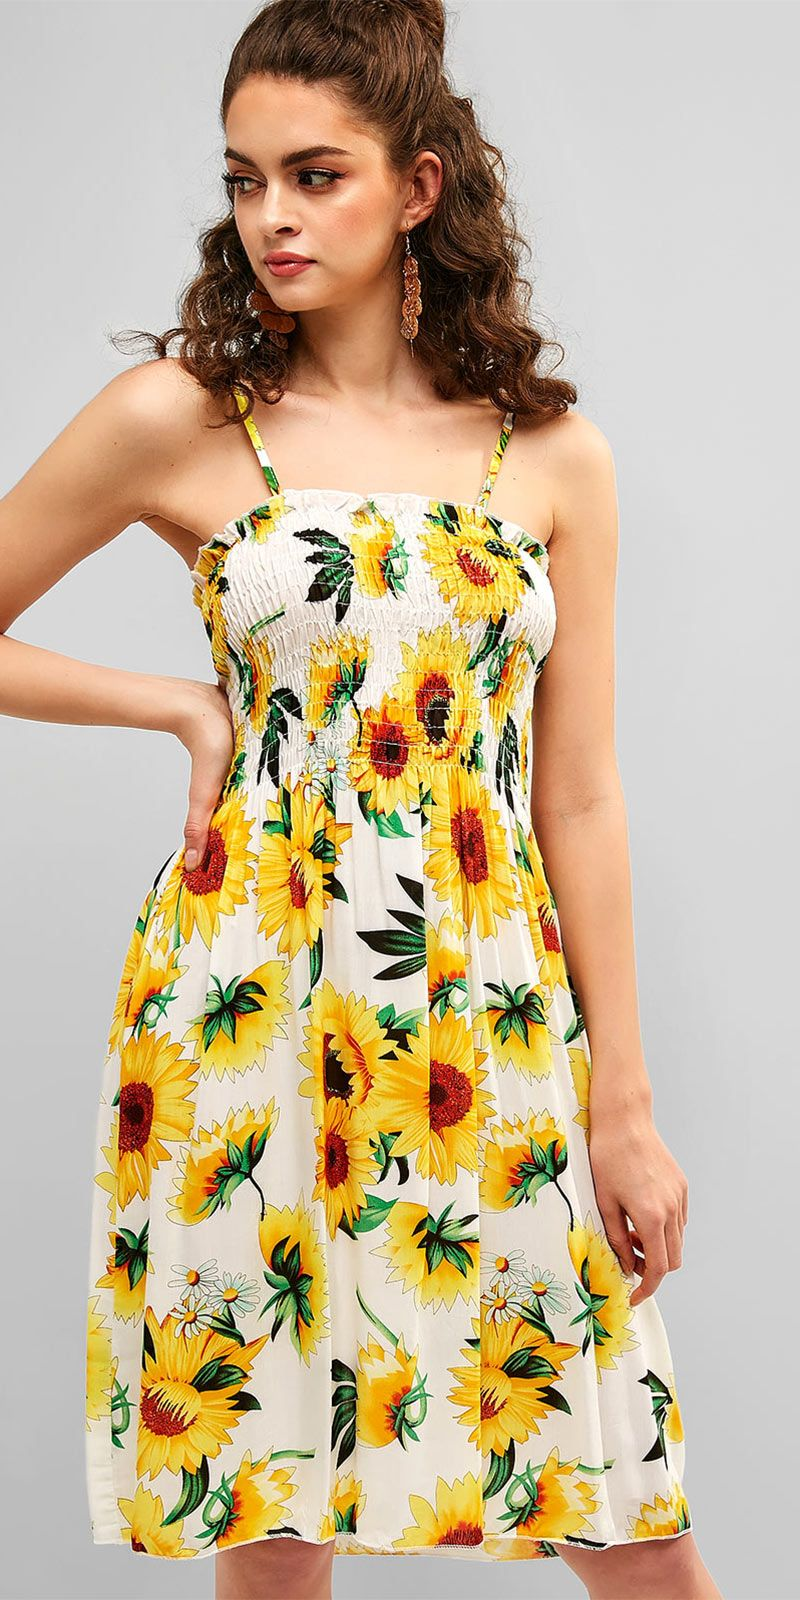 Burning Sunflower Summer Dress Holiday Sundress Yellow Summer Dresses Shirred Dress White Mini Dress [ 1600 x 800 Pixel ]